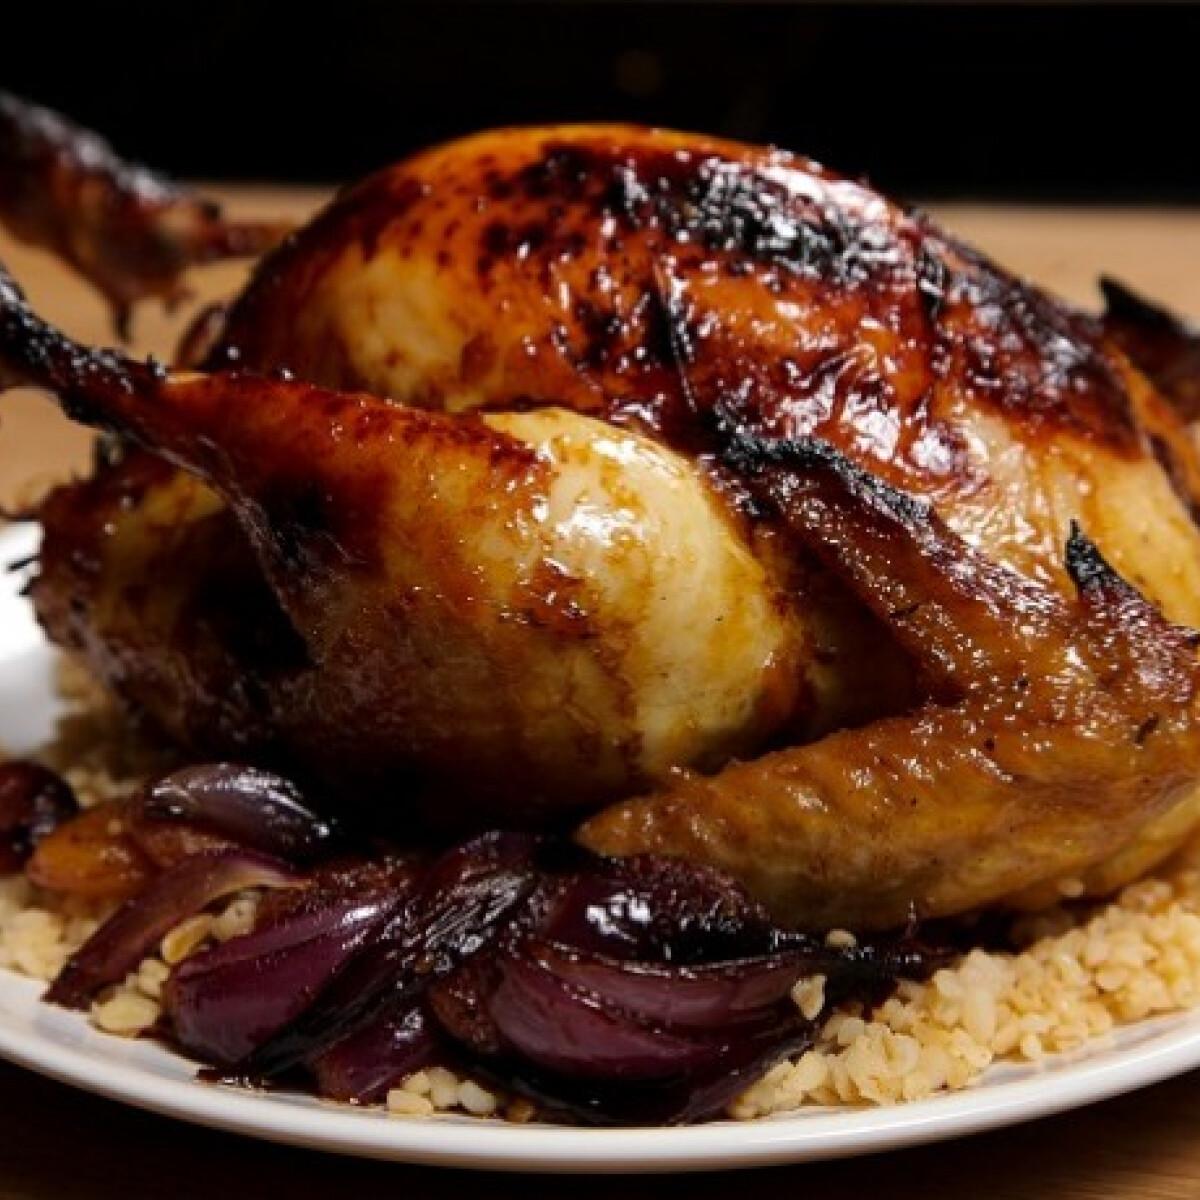 Sárgabarackos marokkói sült csirke bulgurral